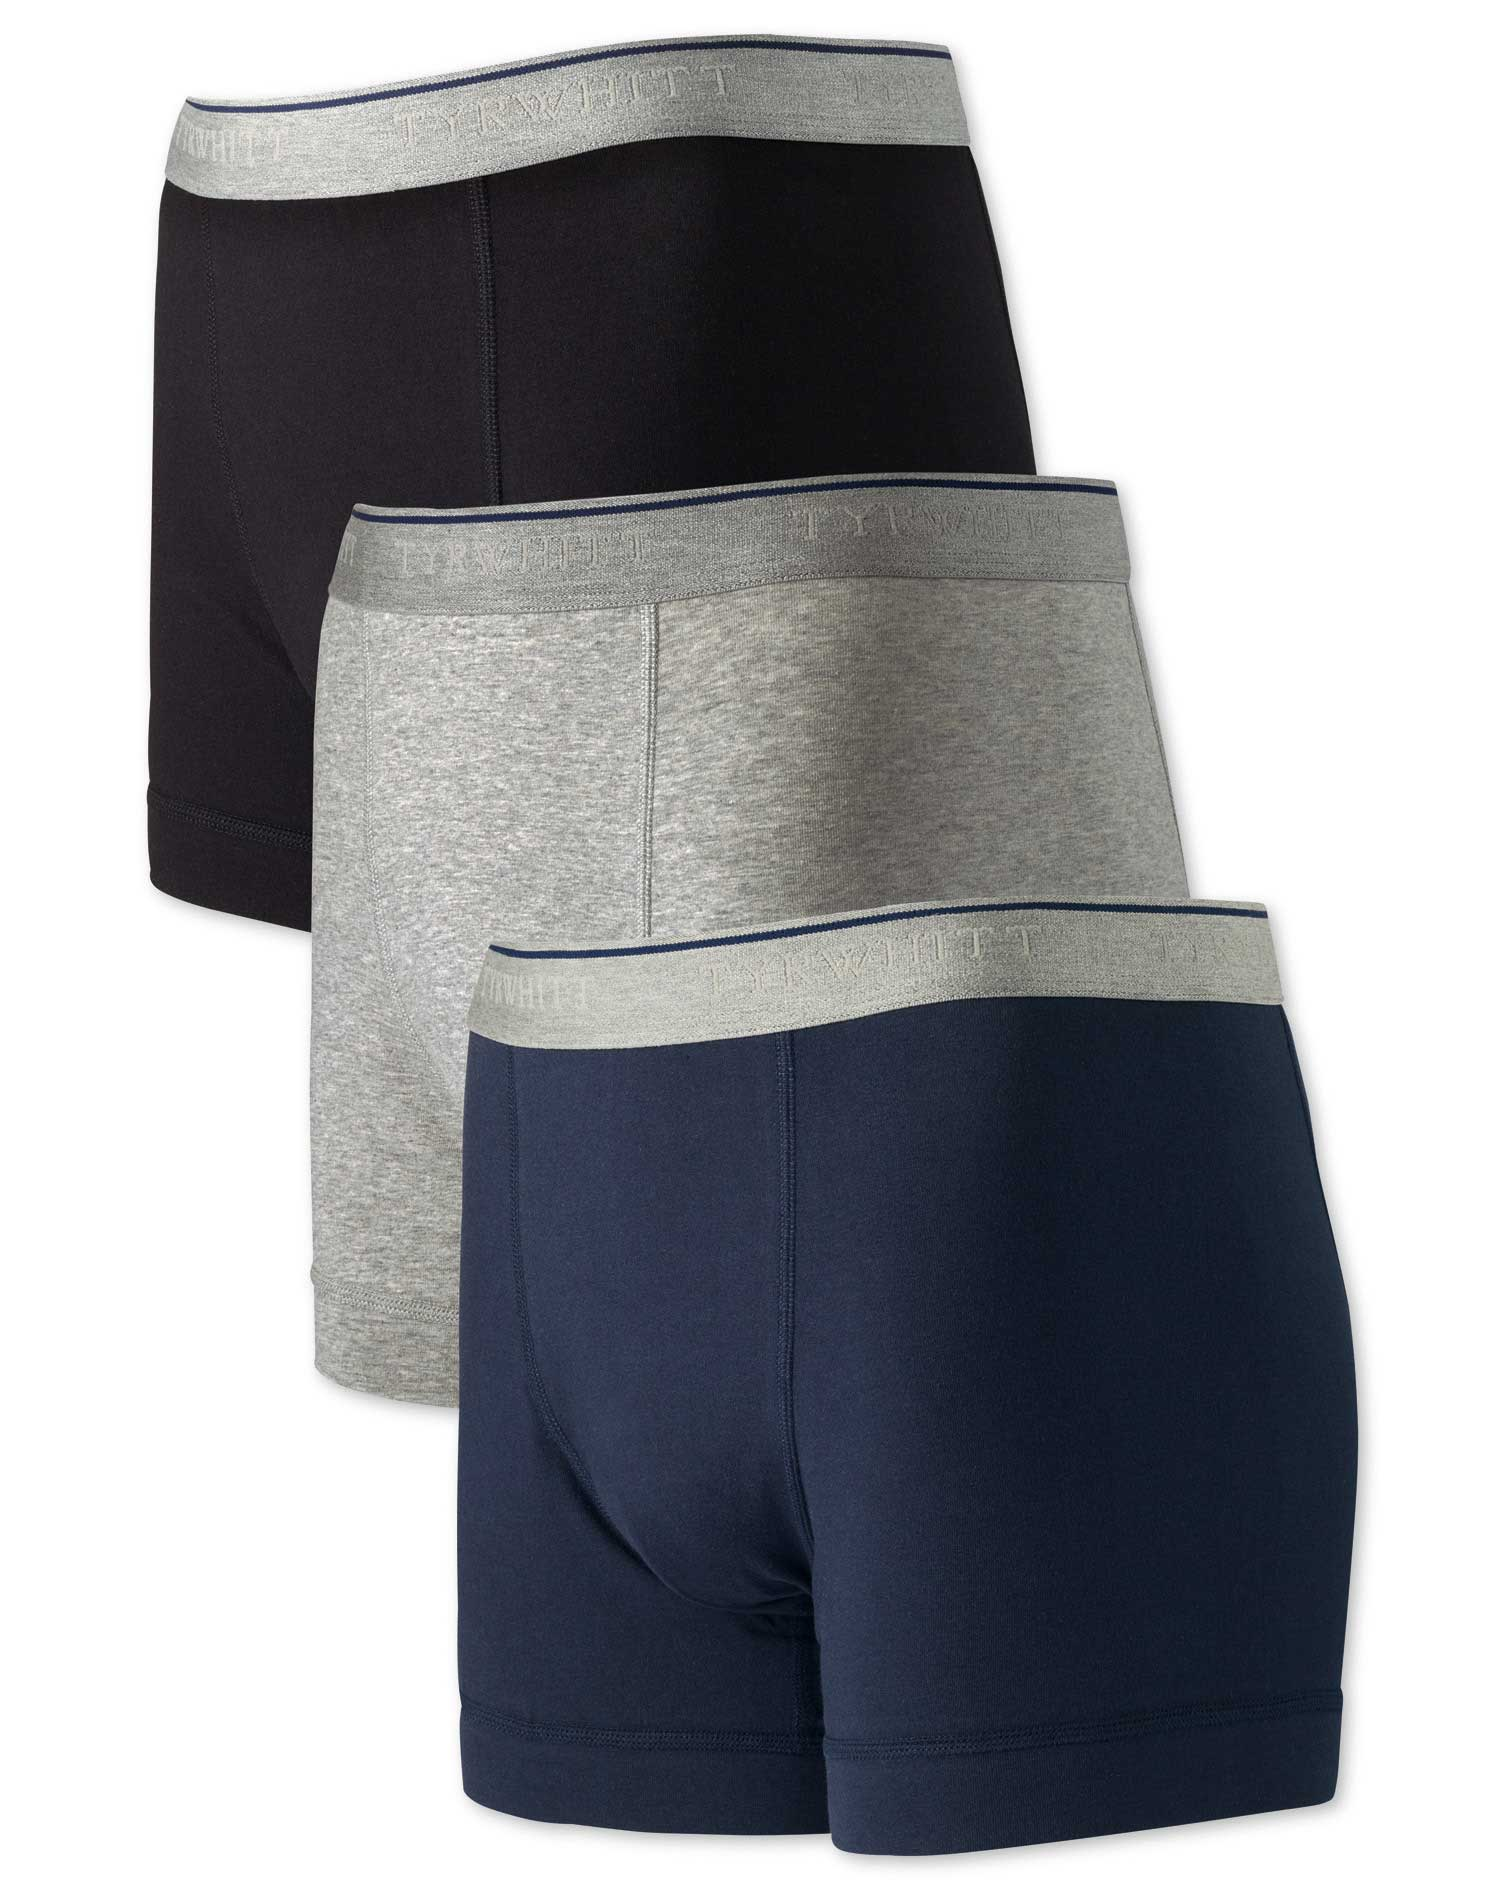 Multi Jersey 3 Pack Trunks Size XS by Charles Tyrwhitt